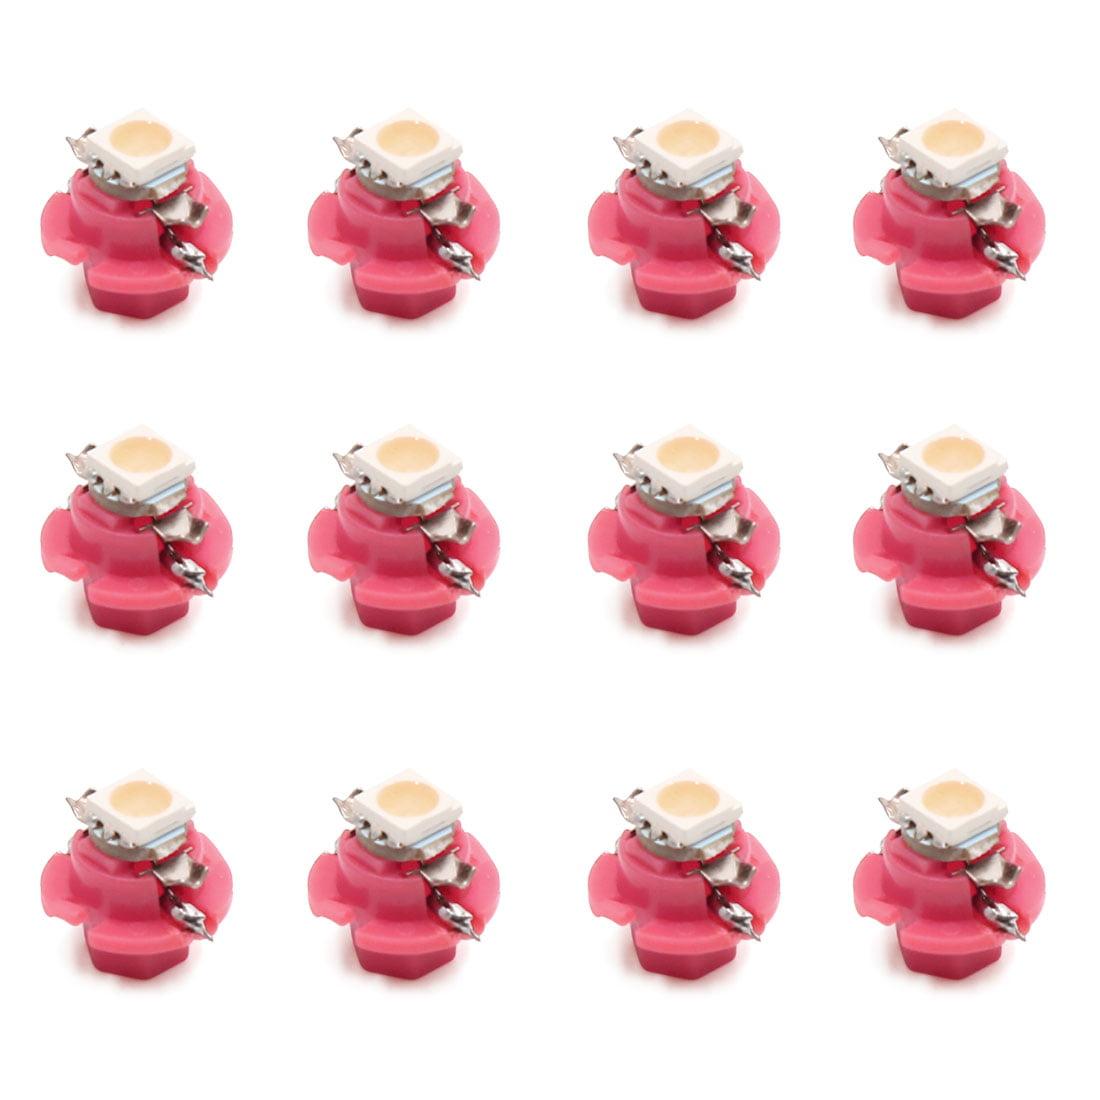 12pcs 12V B8.4 1-5050-SMD Pink LED Car Interior Dashboard Panel Light Bulb - image 5 of 5